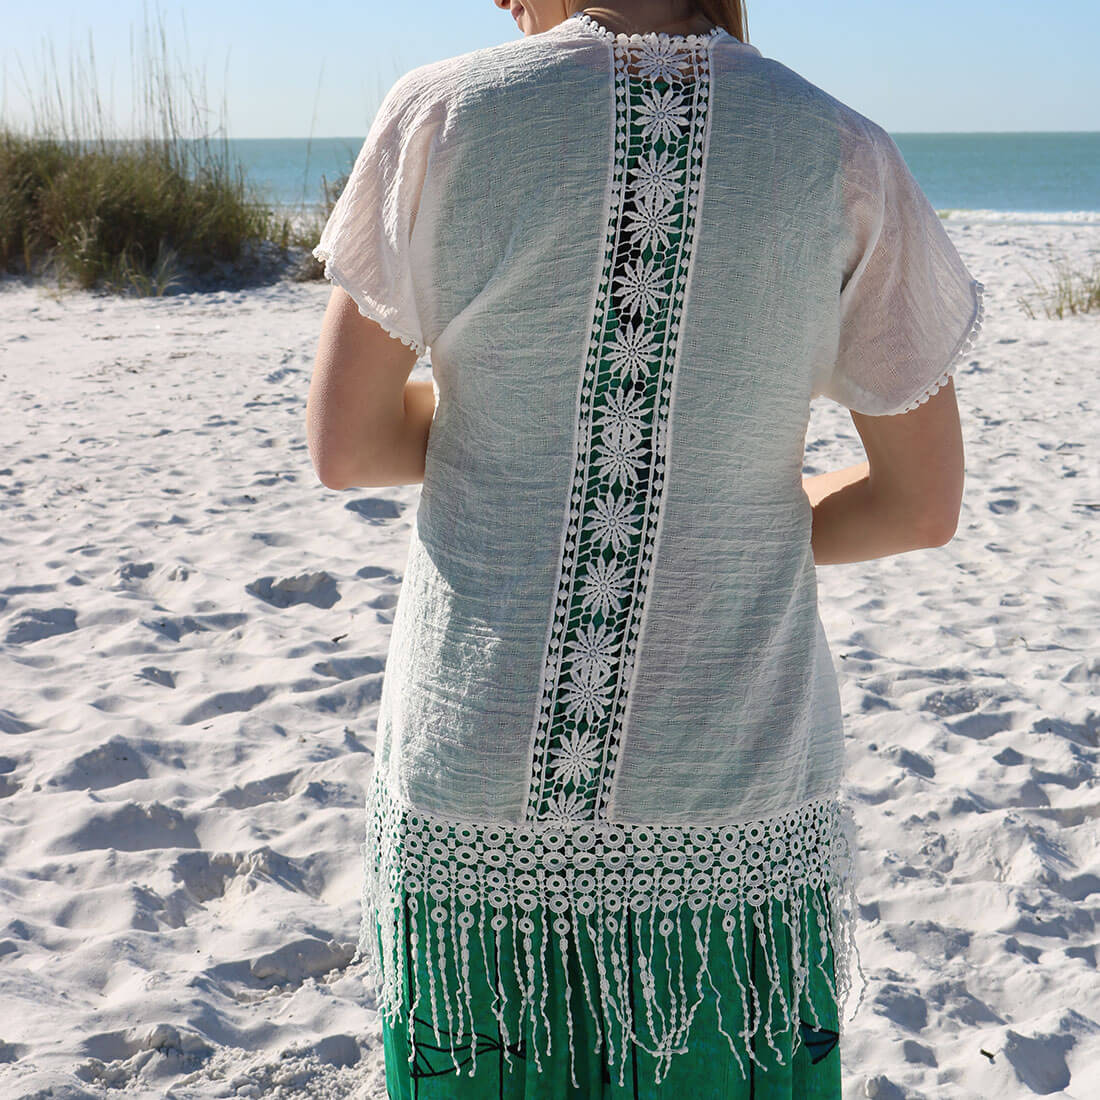 Crochet Back Fringe Trim Cardigan